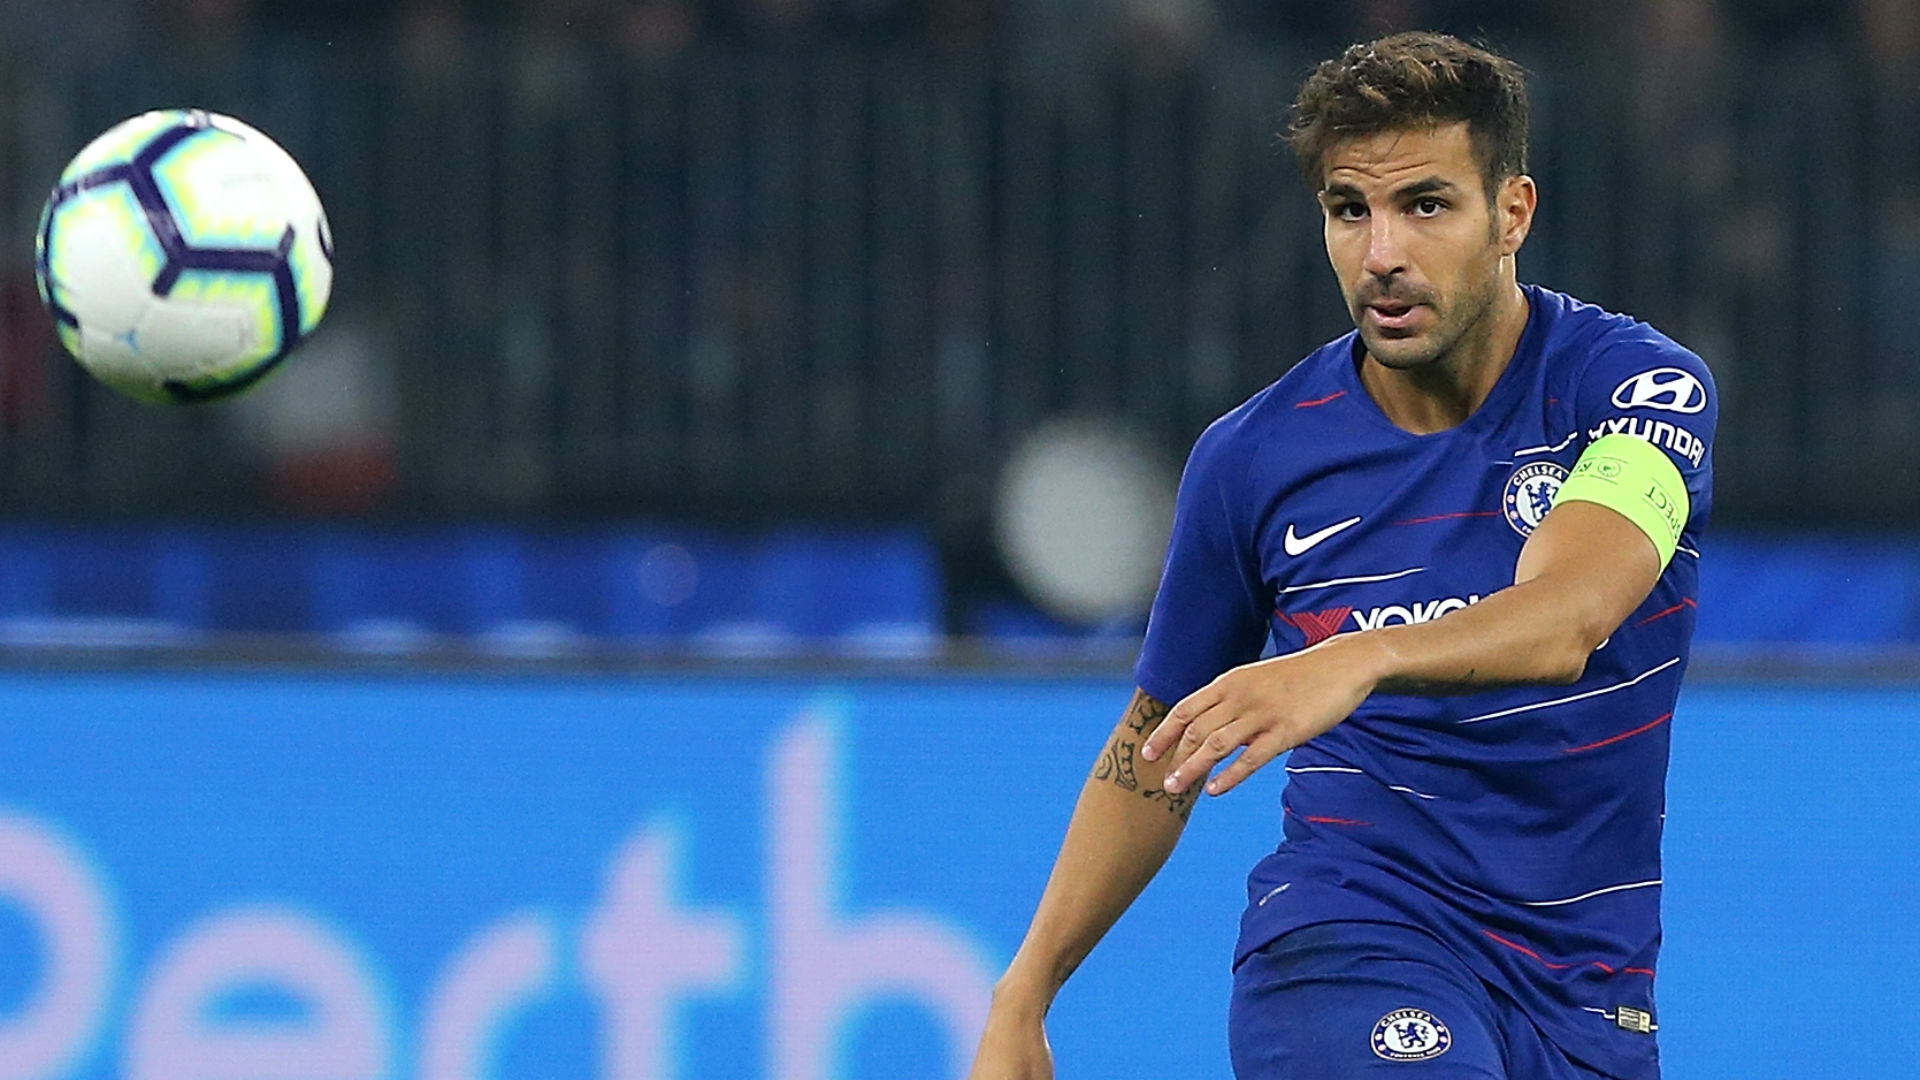 Chelsea pre-season 2018-19: Fixtures, transfers, squad